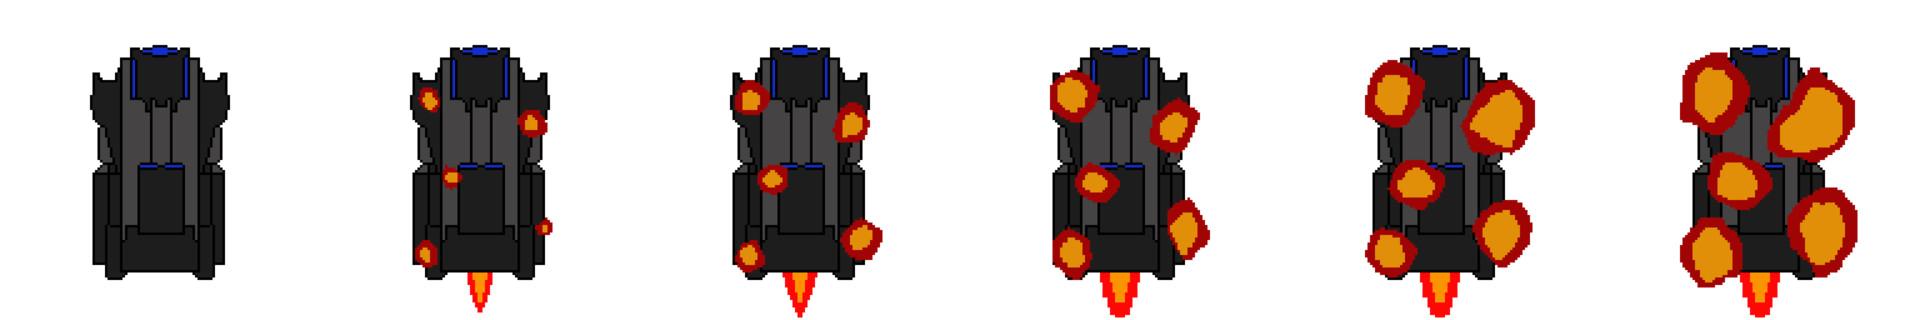 Joao salvadoretti enemyexplosion1